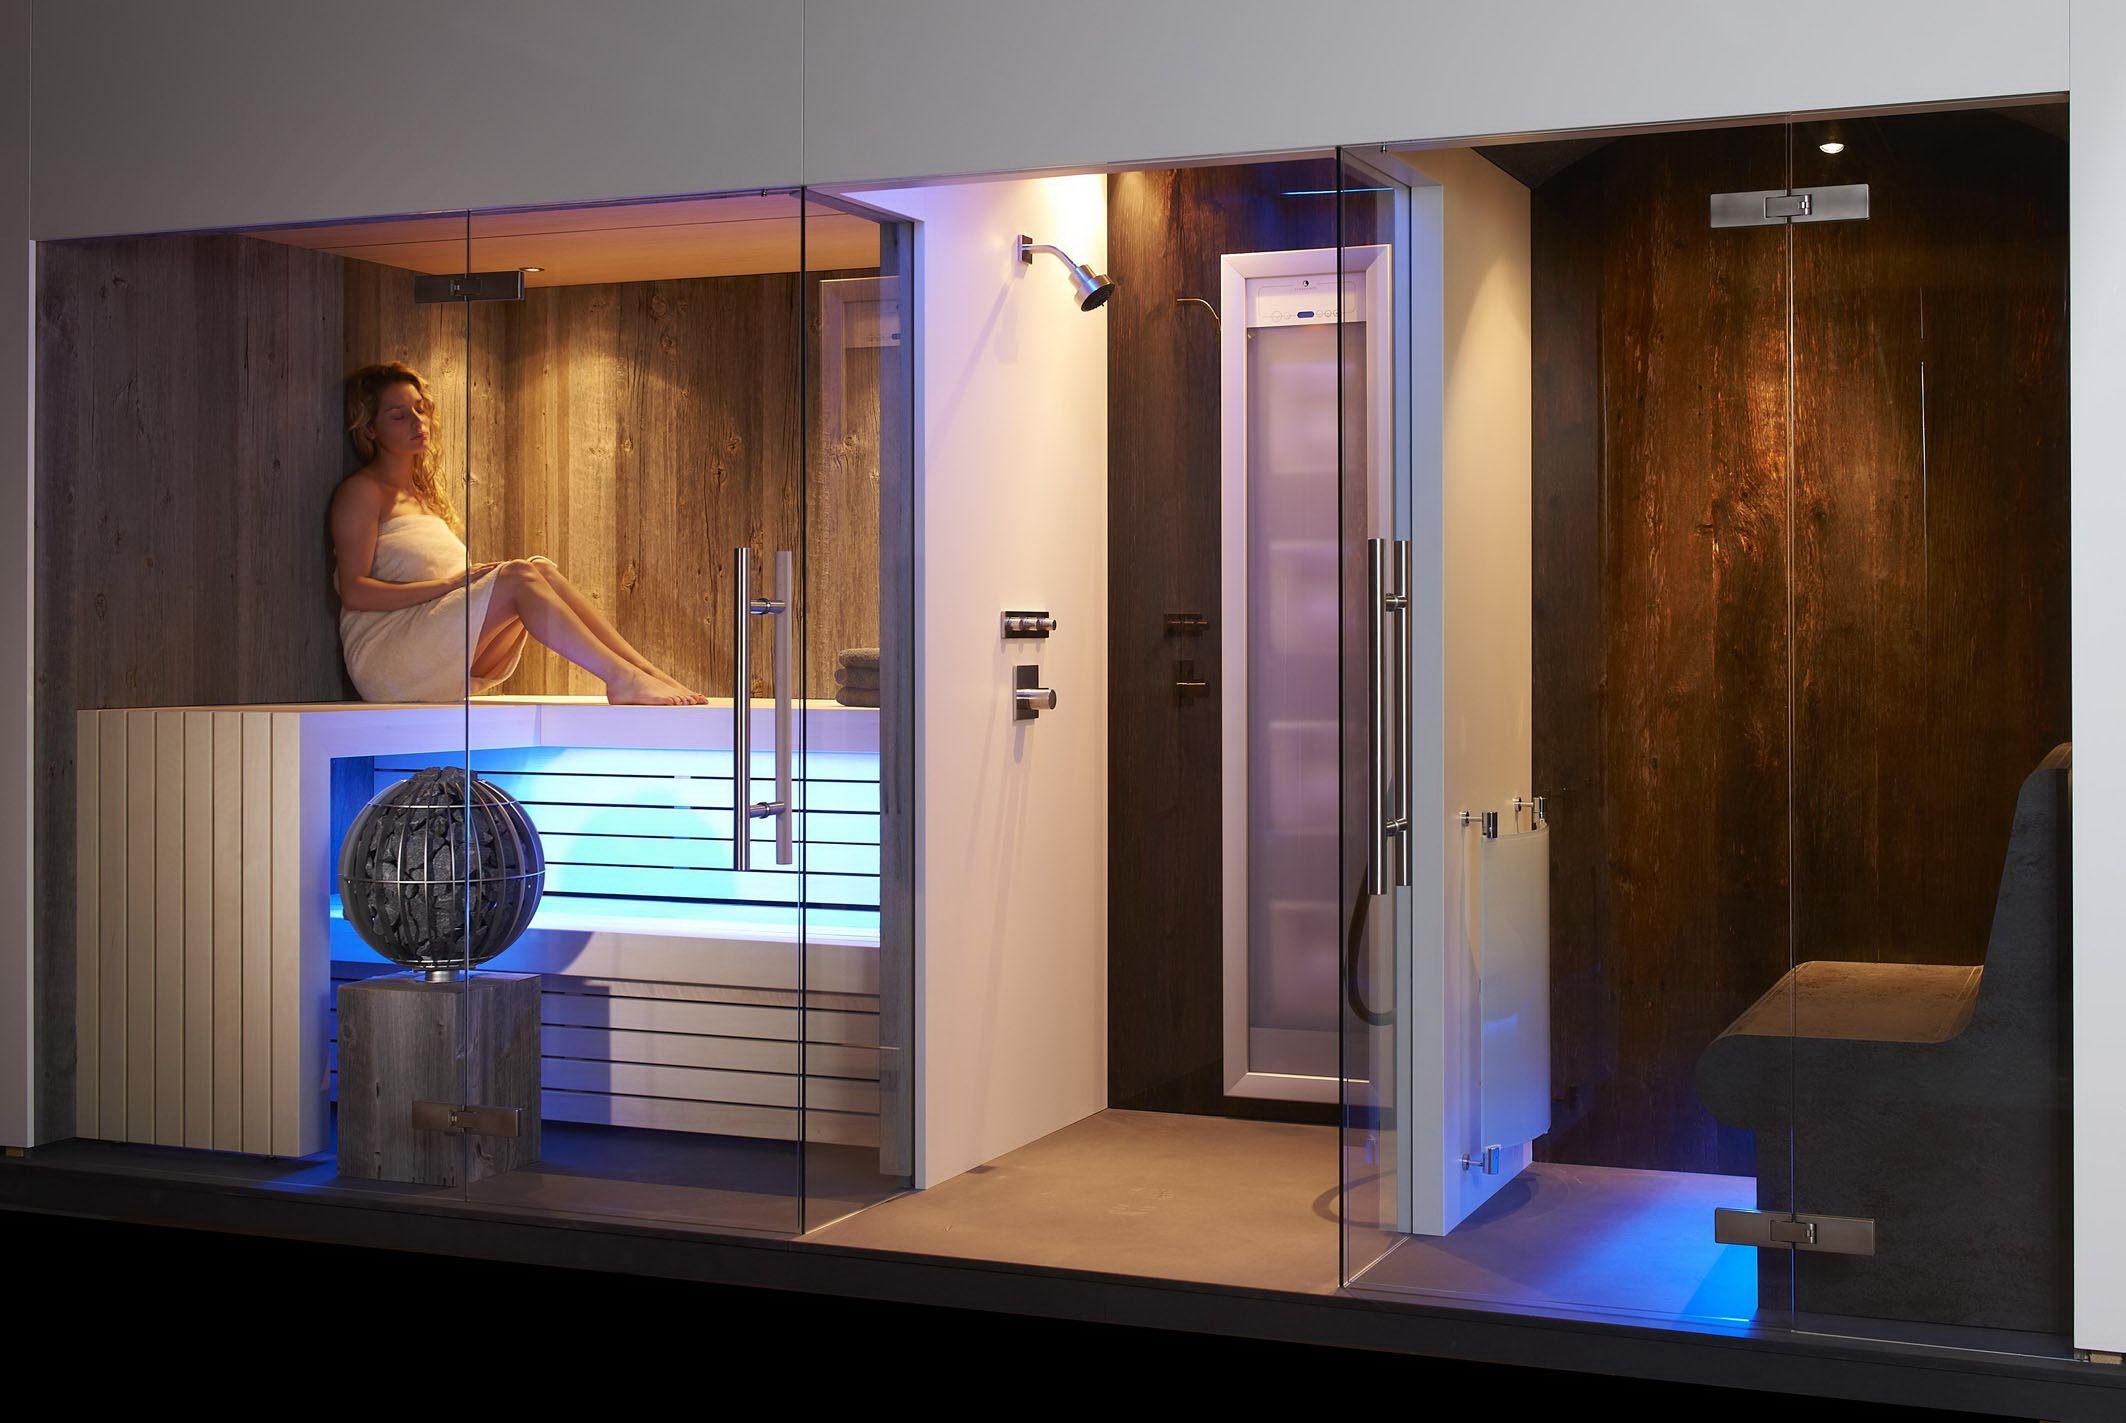 Home Spa, Saunas, Jacuzzi, Steam Room, Whirlpool Bathtub